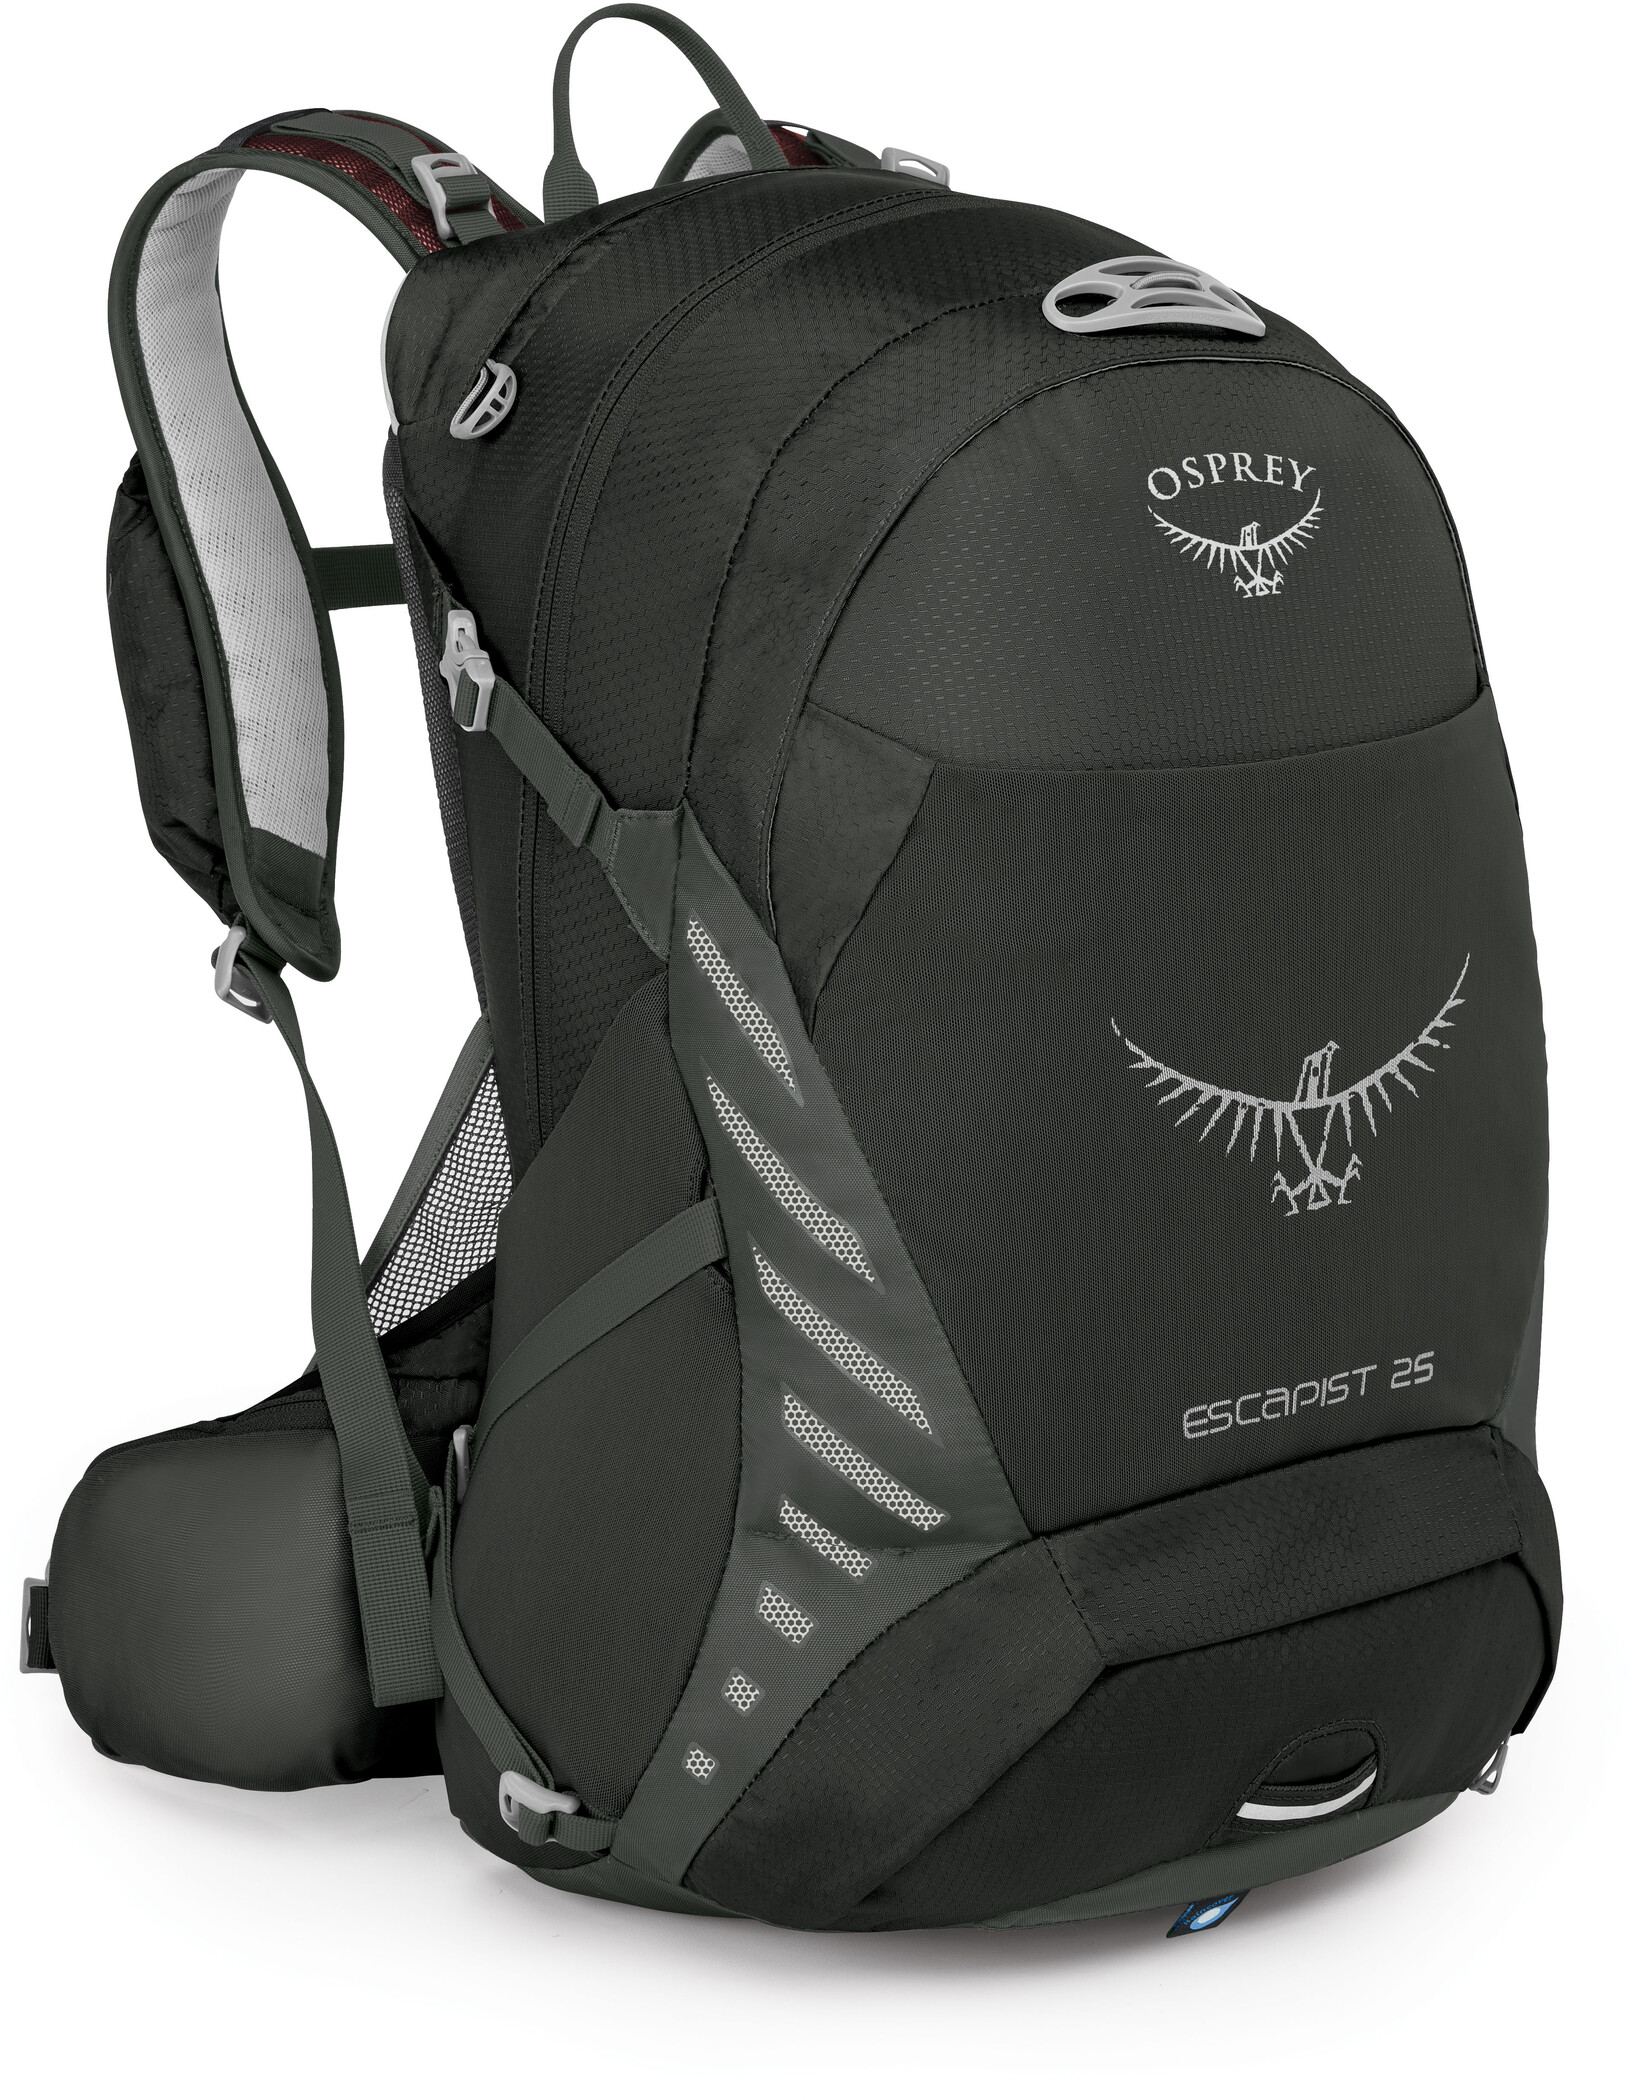 Osprey - Escapist 25 | travel bag